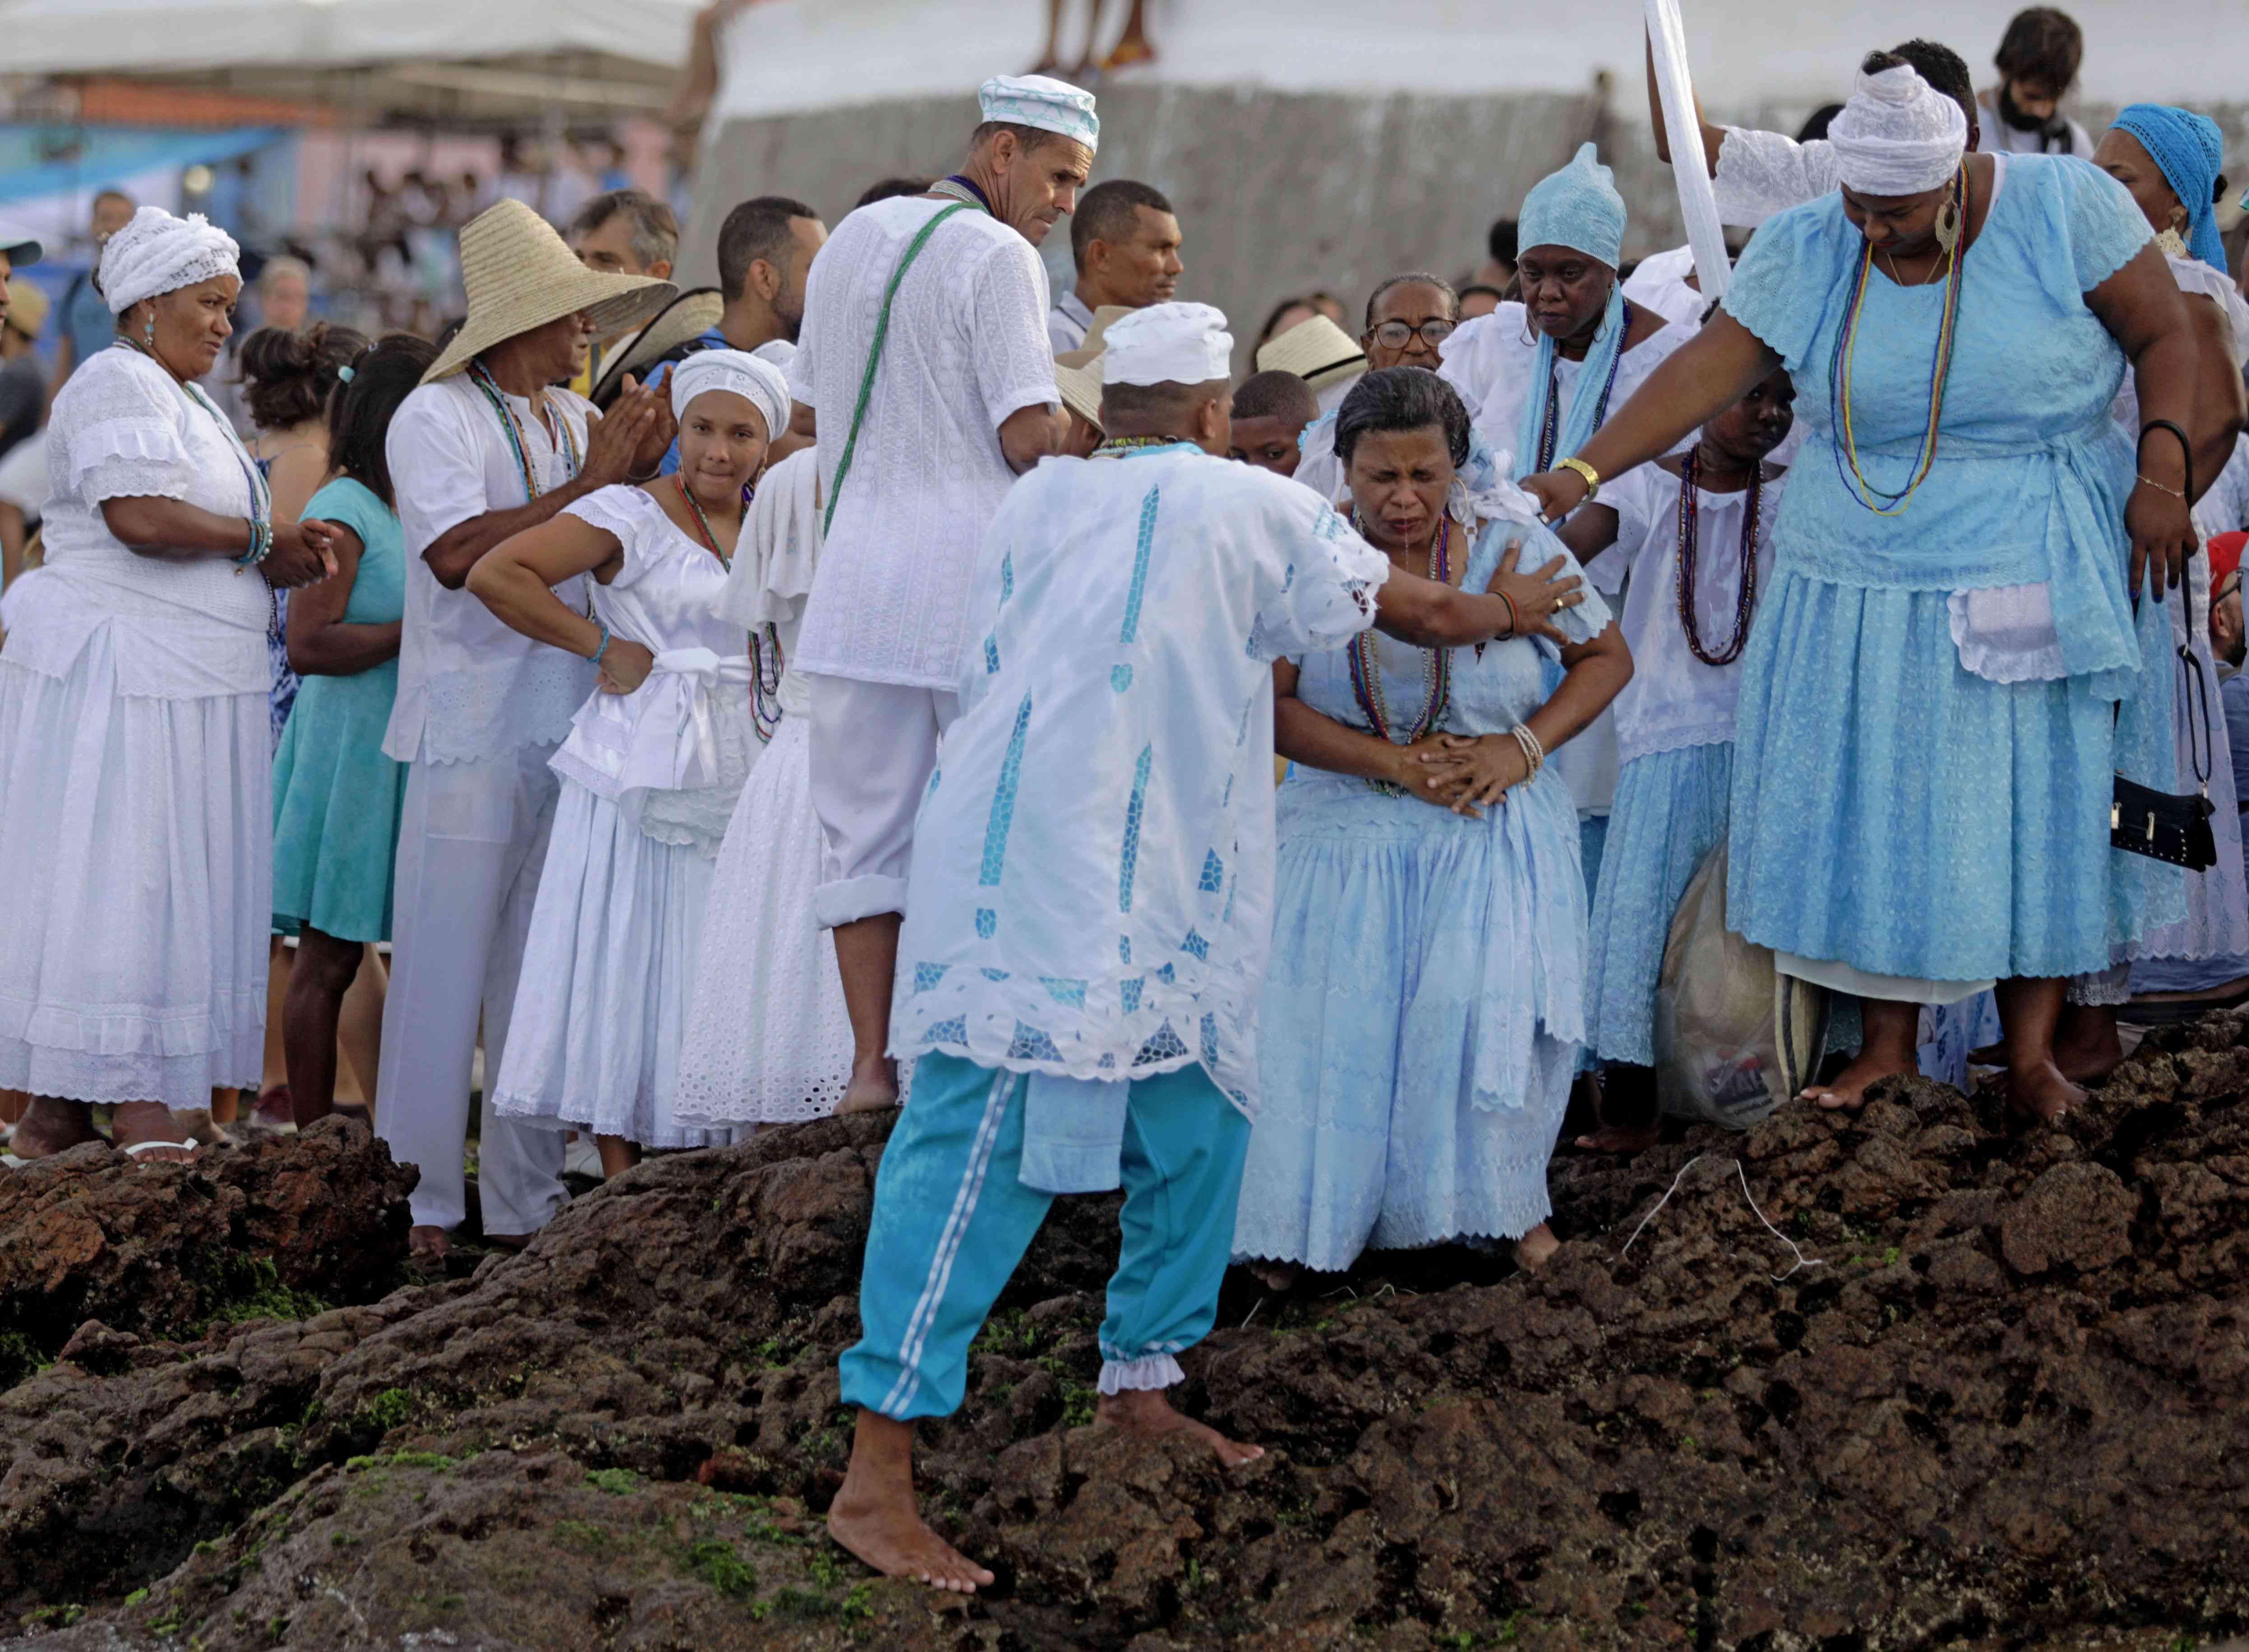 BRAZIL-RELIGION-CANDOMBLE-YEMANJA